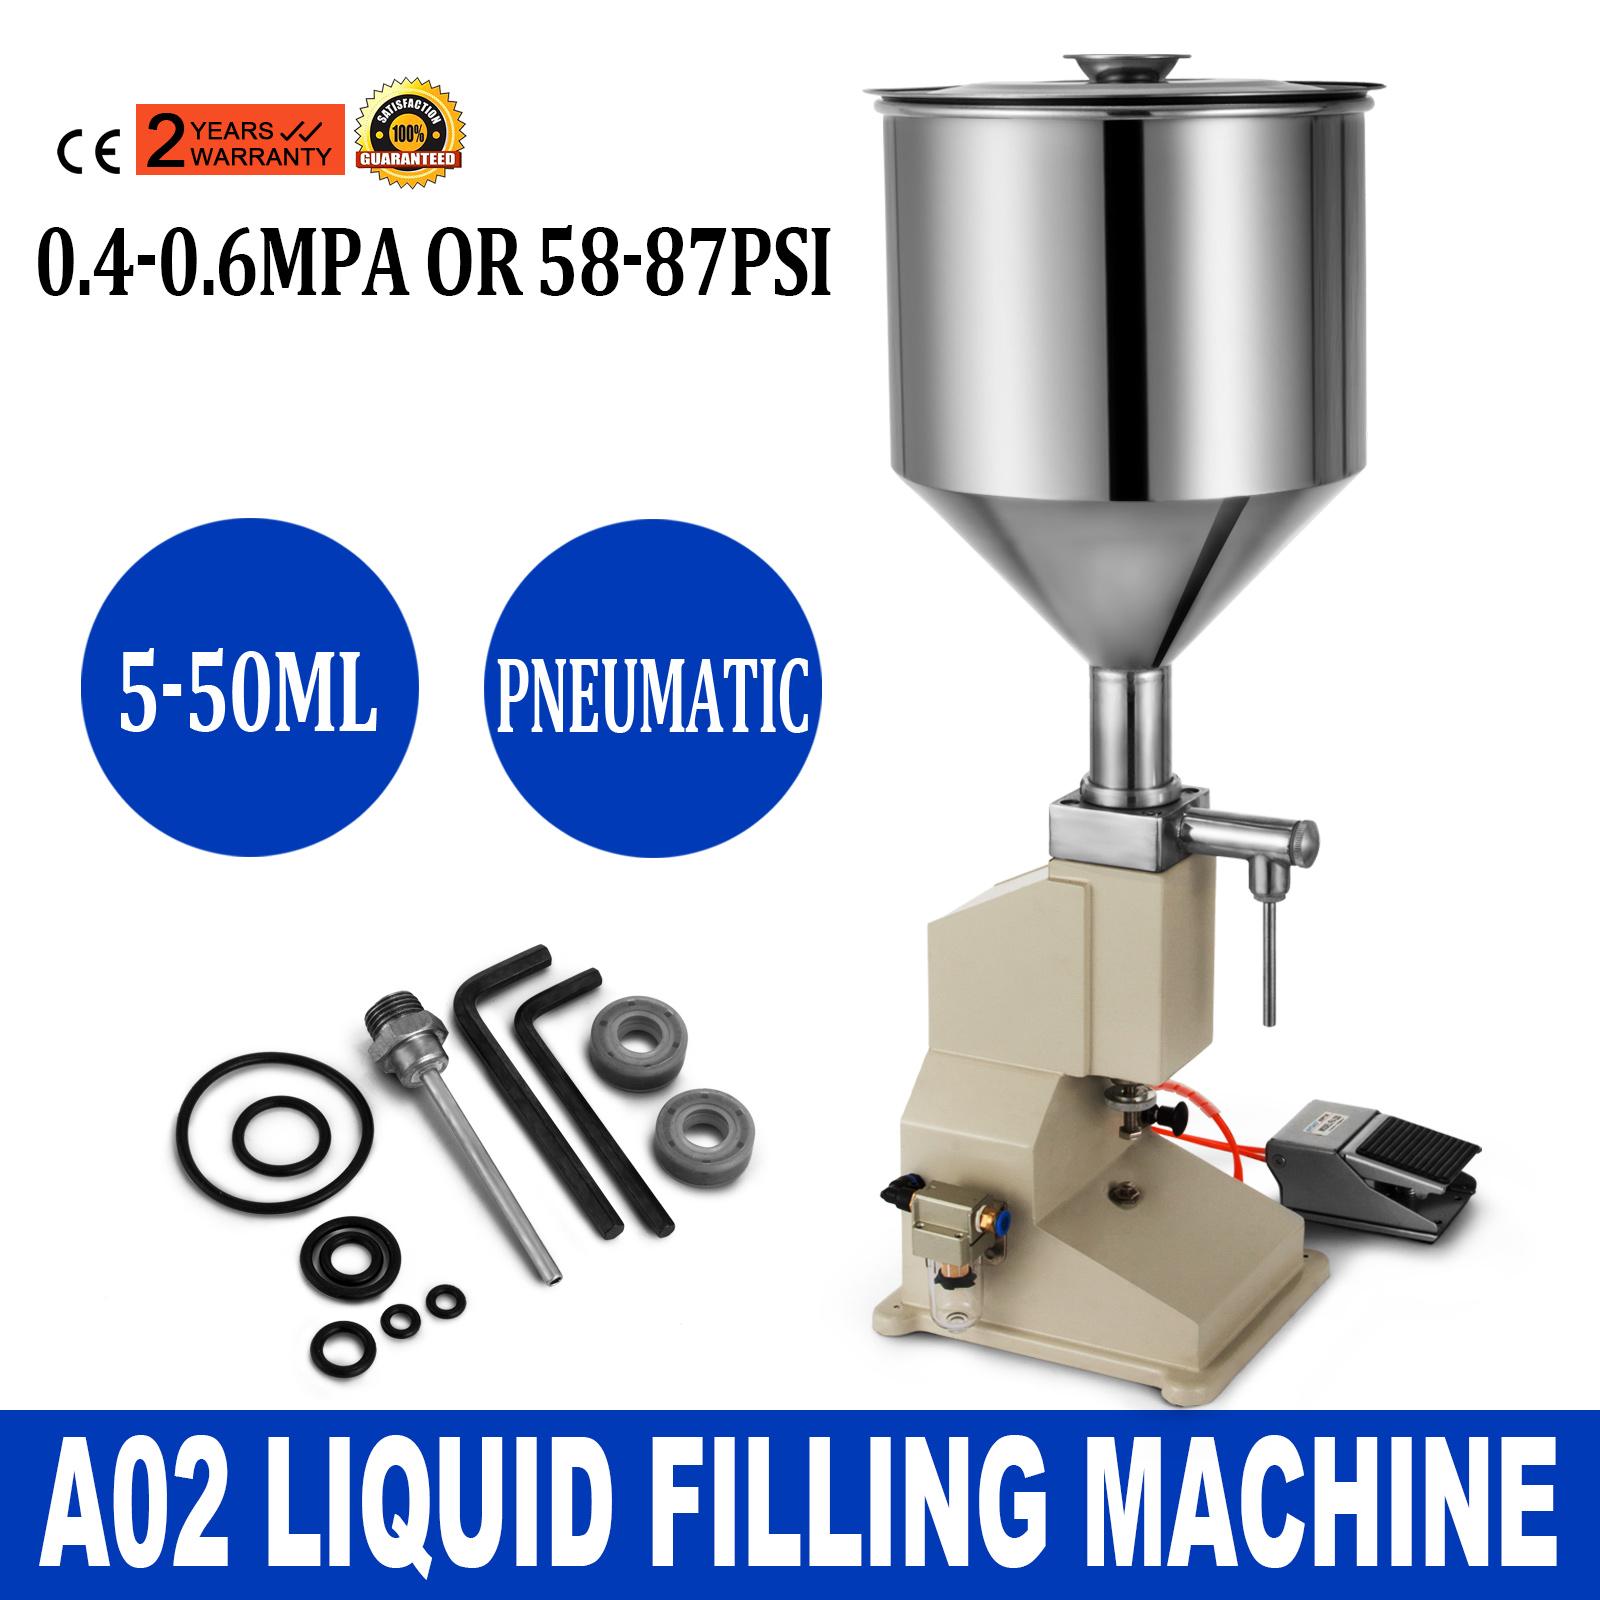 Liquid-Filling-Machine-Filler-Remplissage-2-3500ML-50-500ML-INDUSTRY-SUPPLY miniature 49